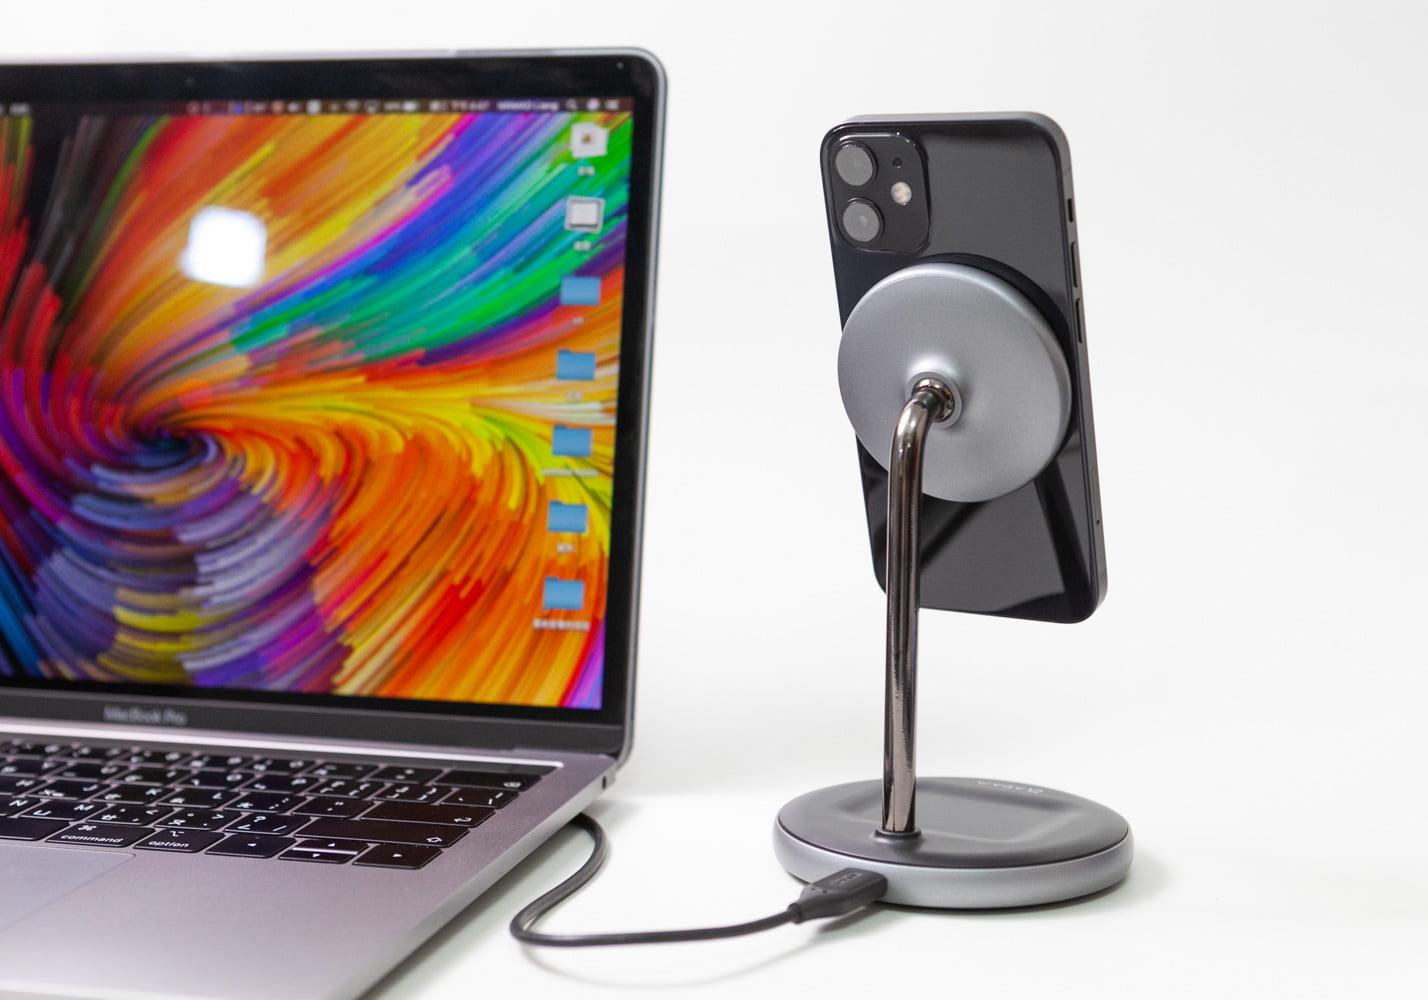 MagSafe 二合一無線充電座 OMNIA M2 開箱,iPhone 12用戶必入手